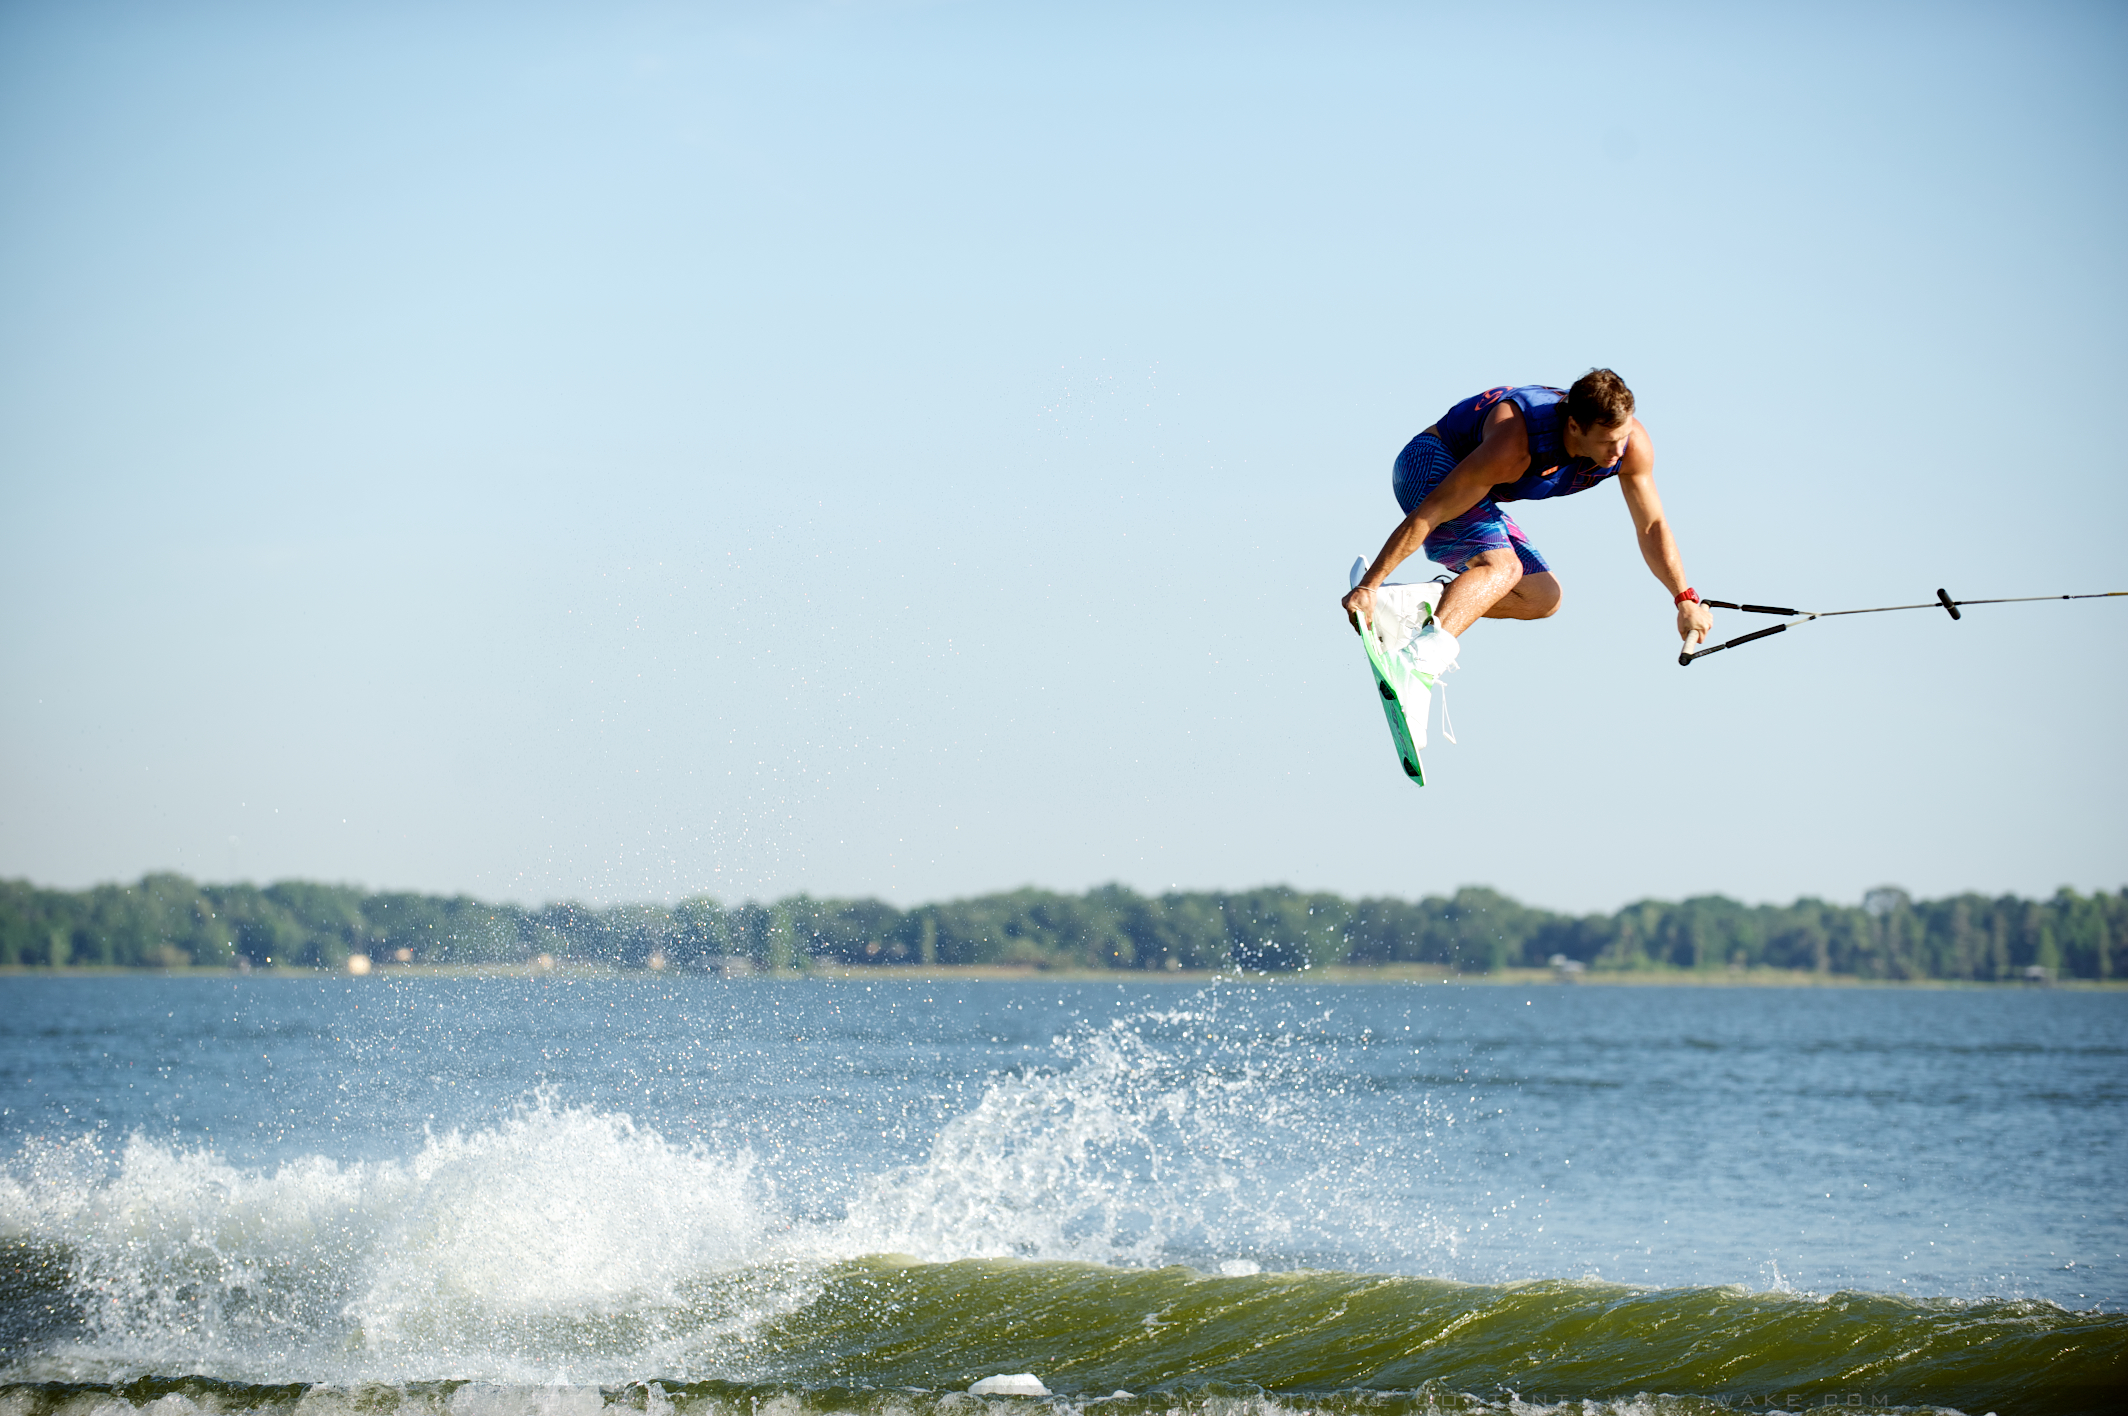 brad smeele pro wakeboarder new zealand